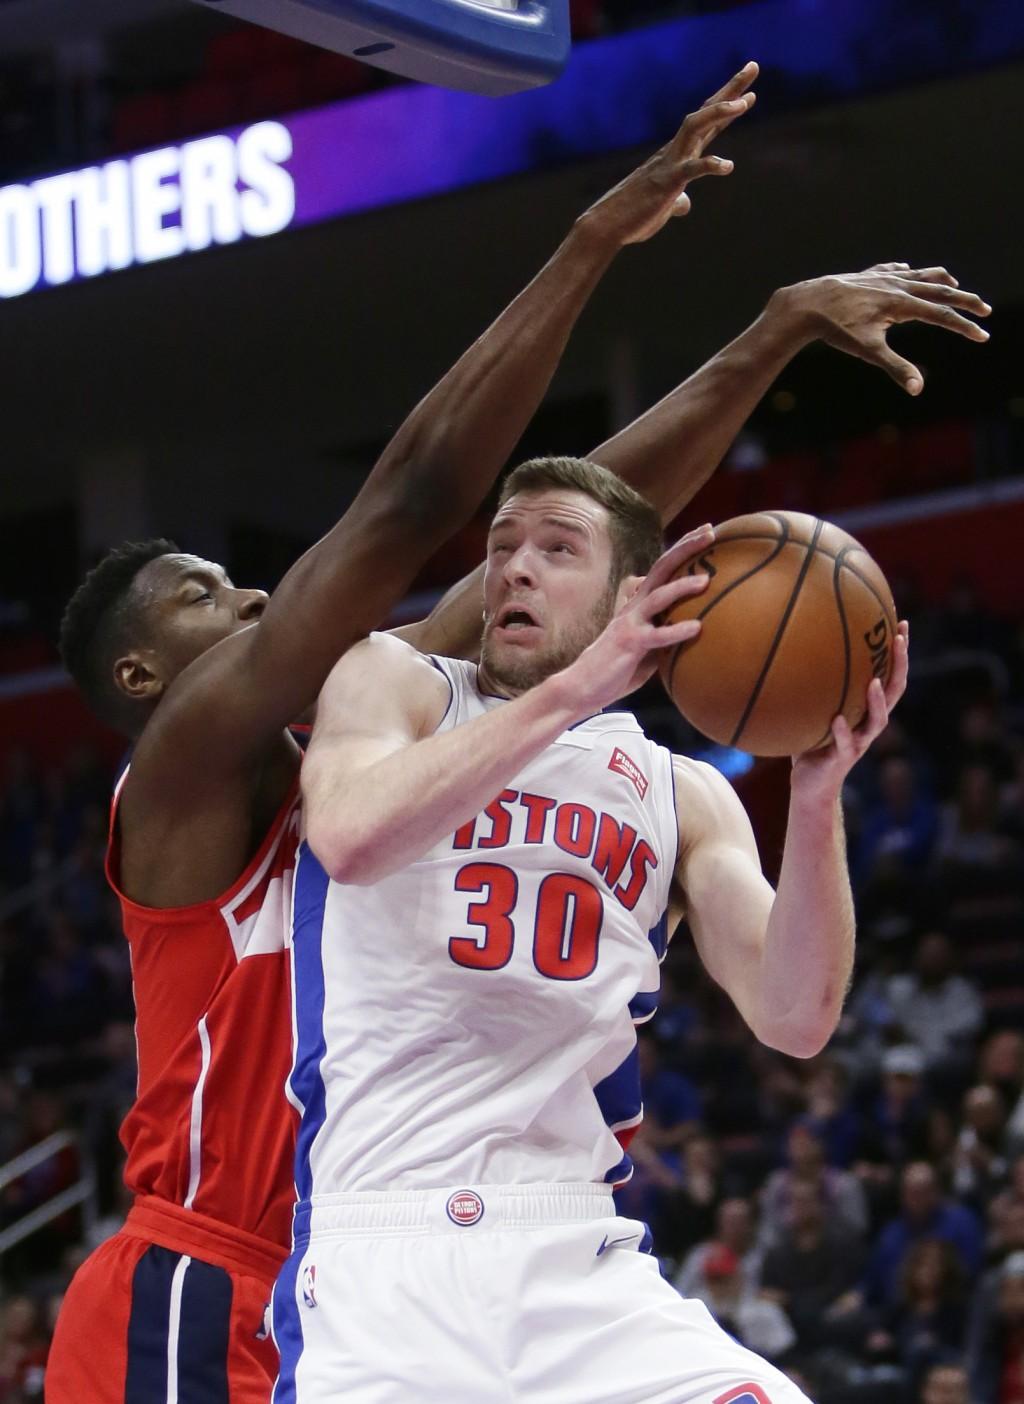 Detroit Pistons forward Jon Leuer (30) goes to the basket against Washington Wizards center Ian Mahinmi, left, during the first half of an NBA basketb...